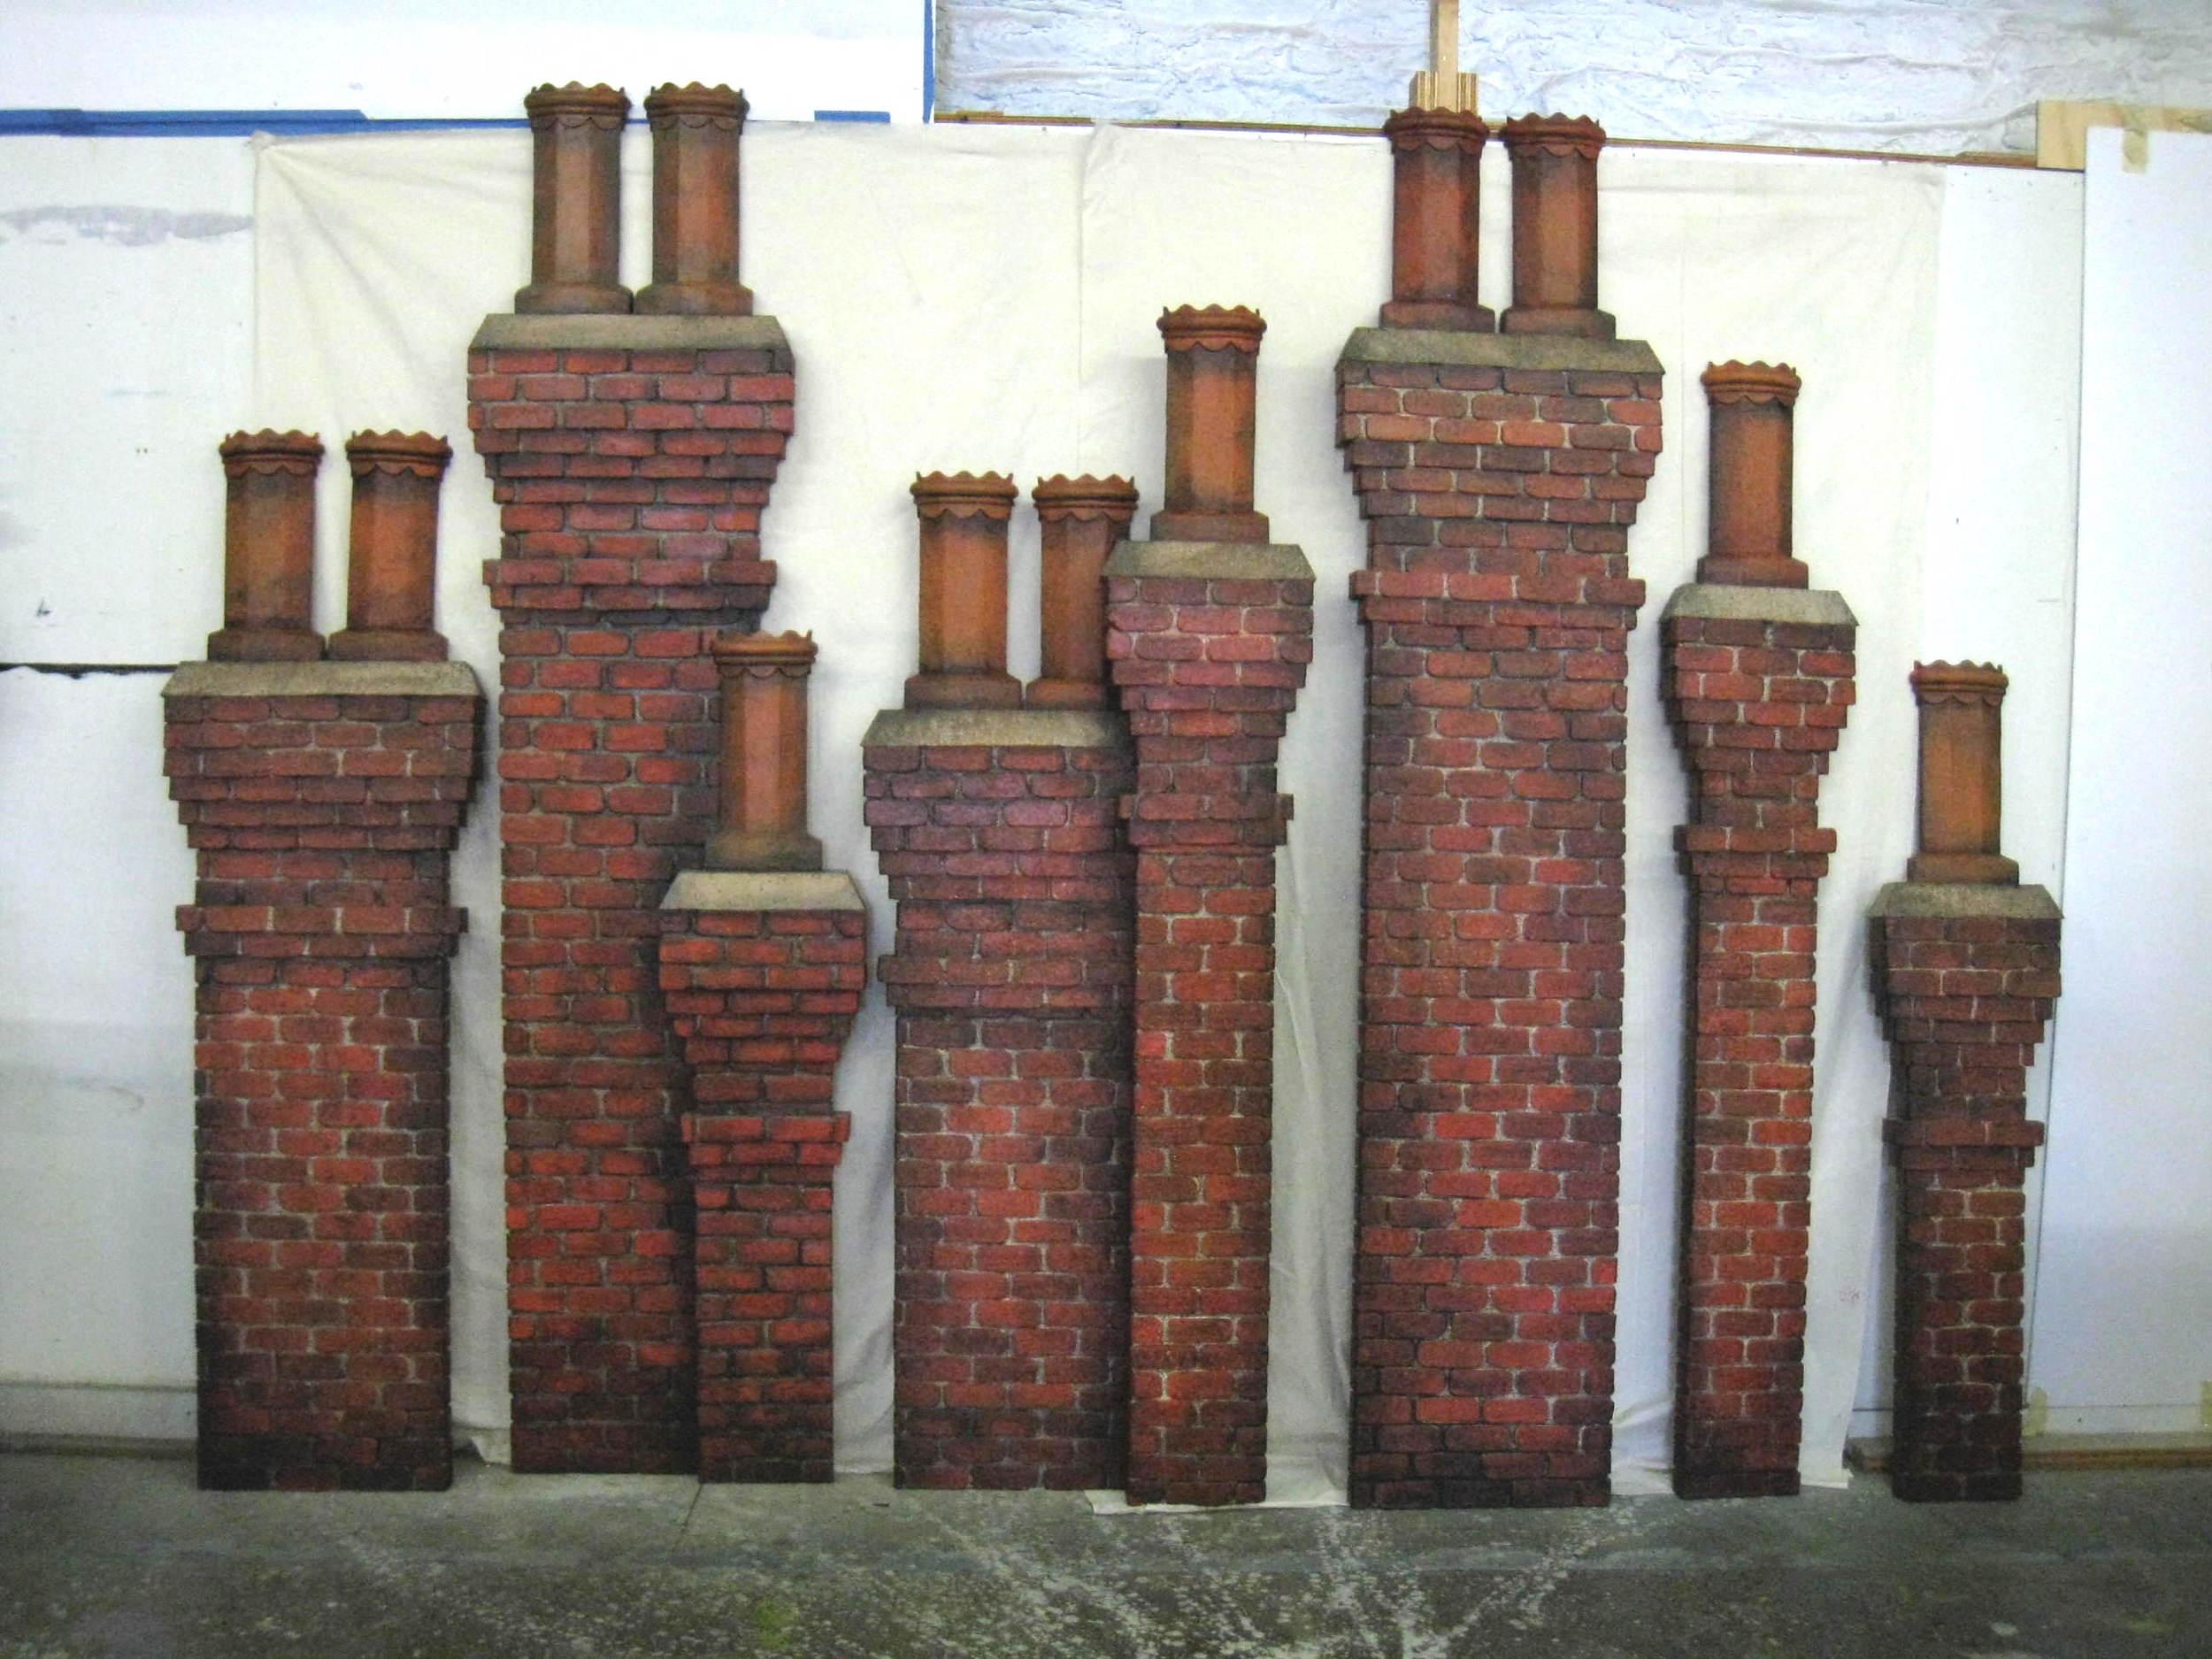 Walk Around Chimneys: The Addams Family